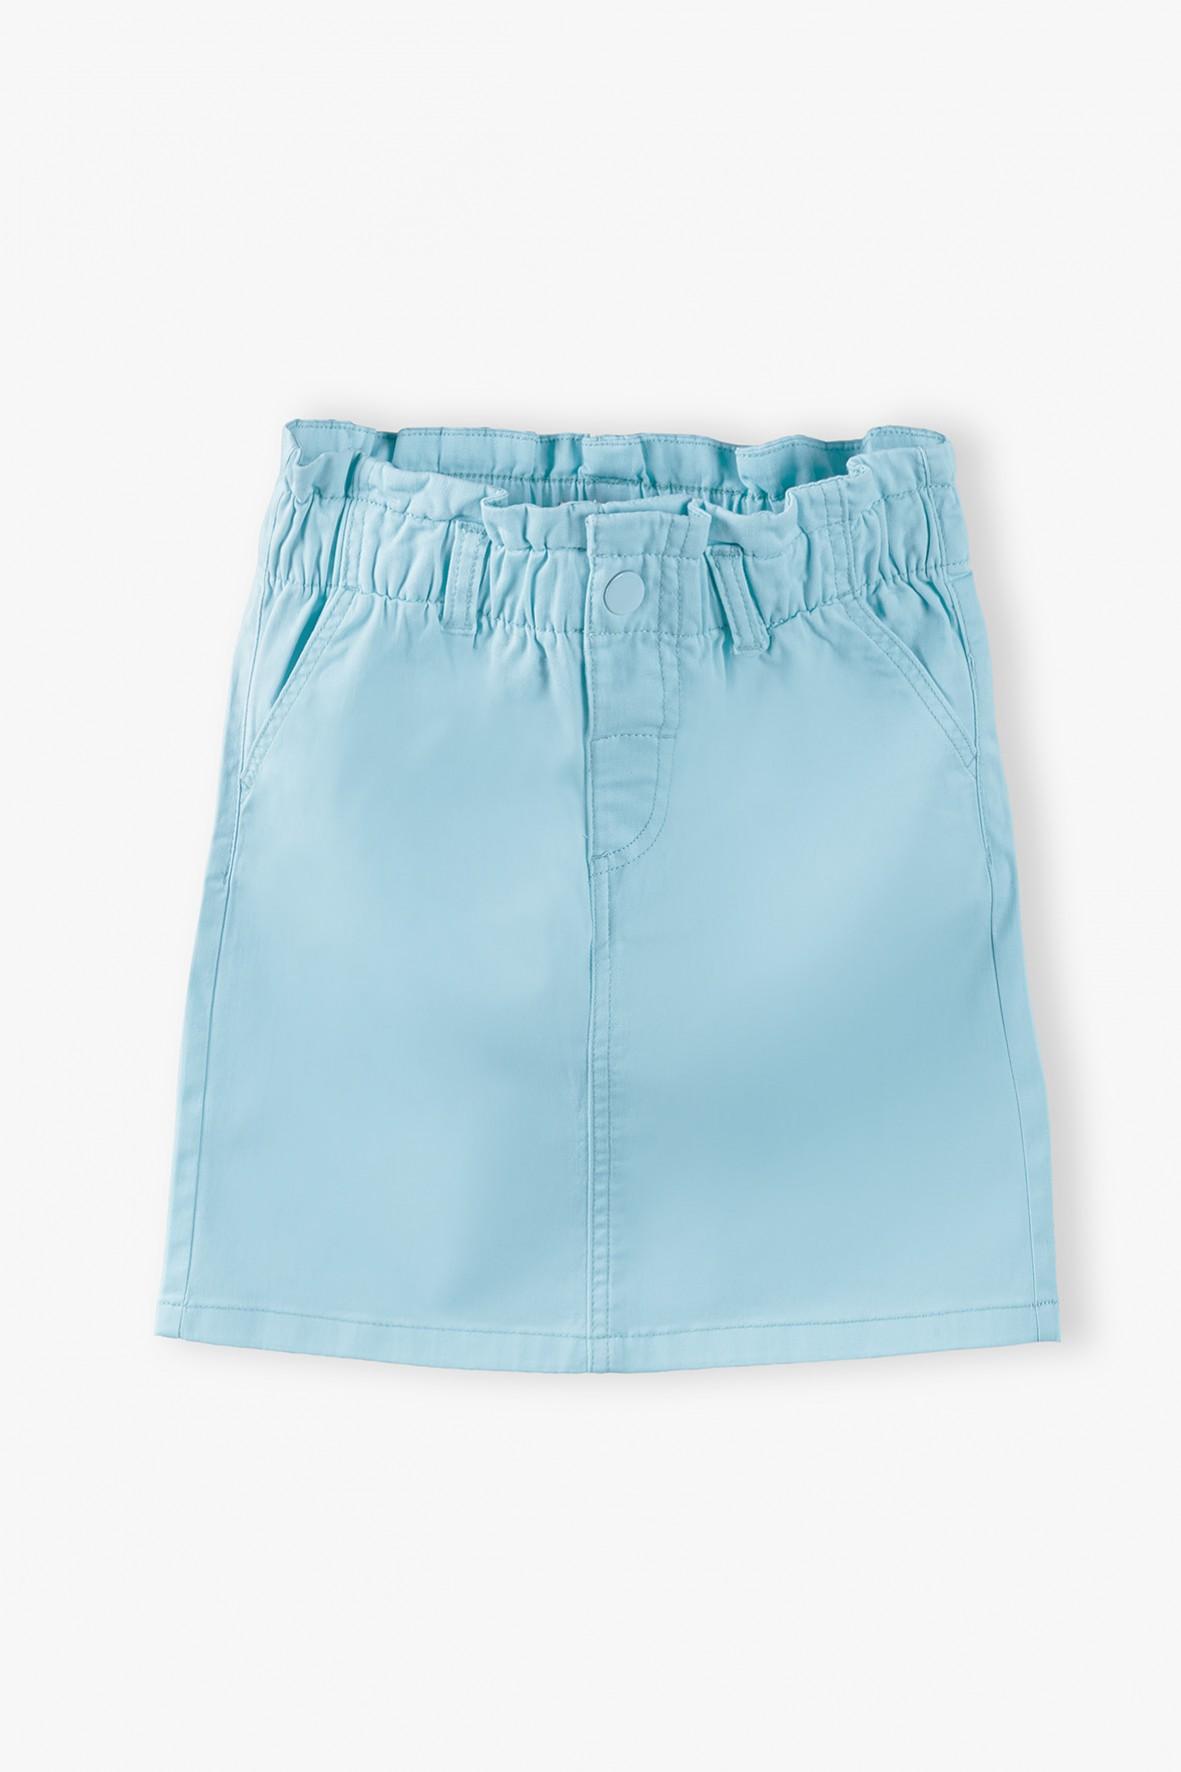 Spódnica dziecięca - niebieska